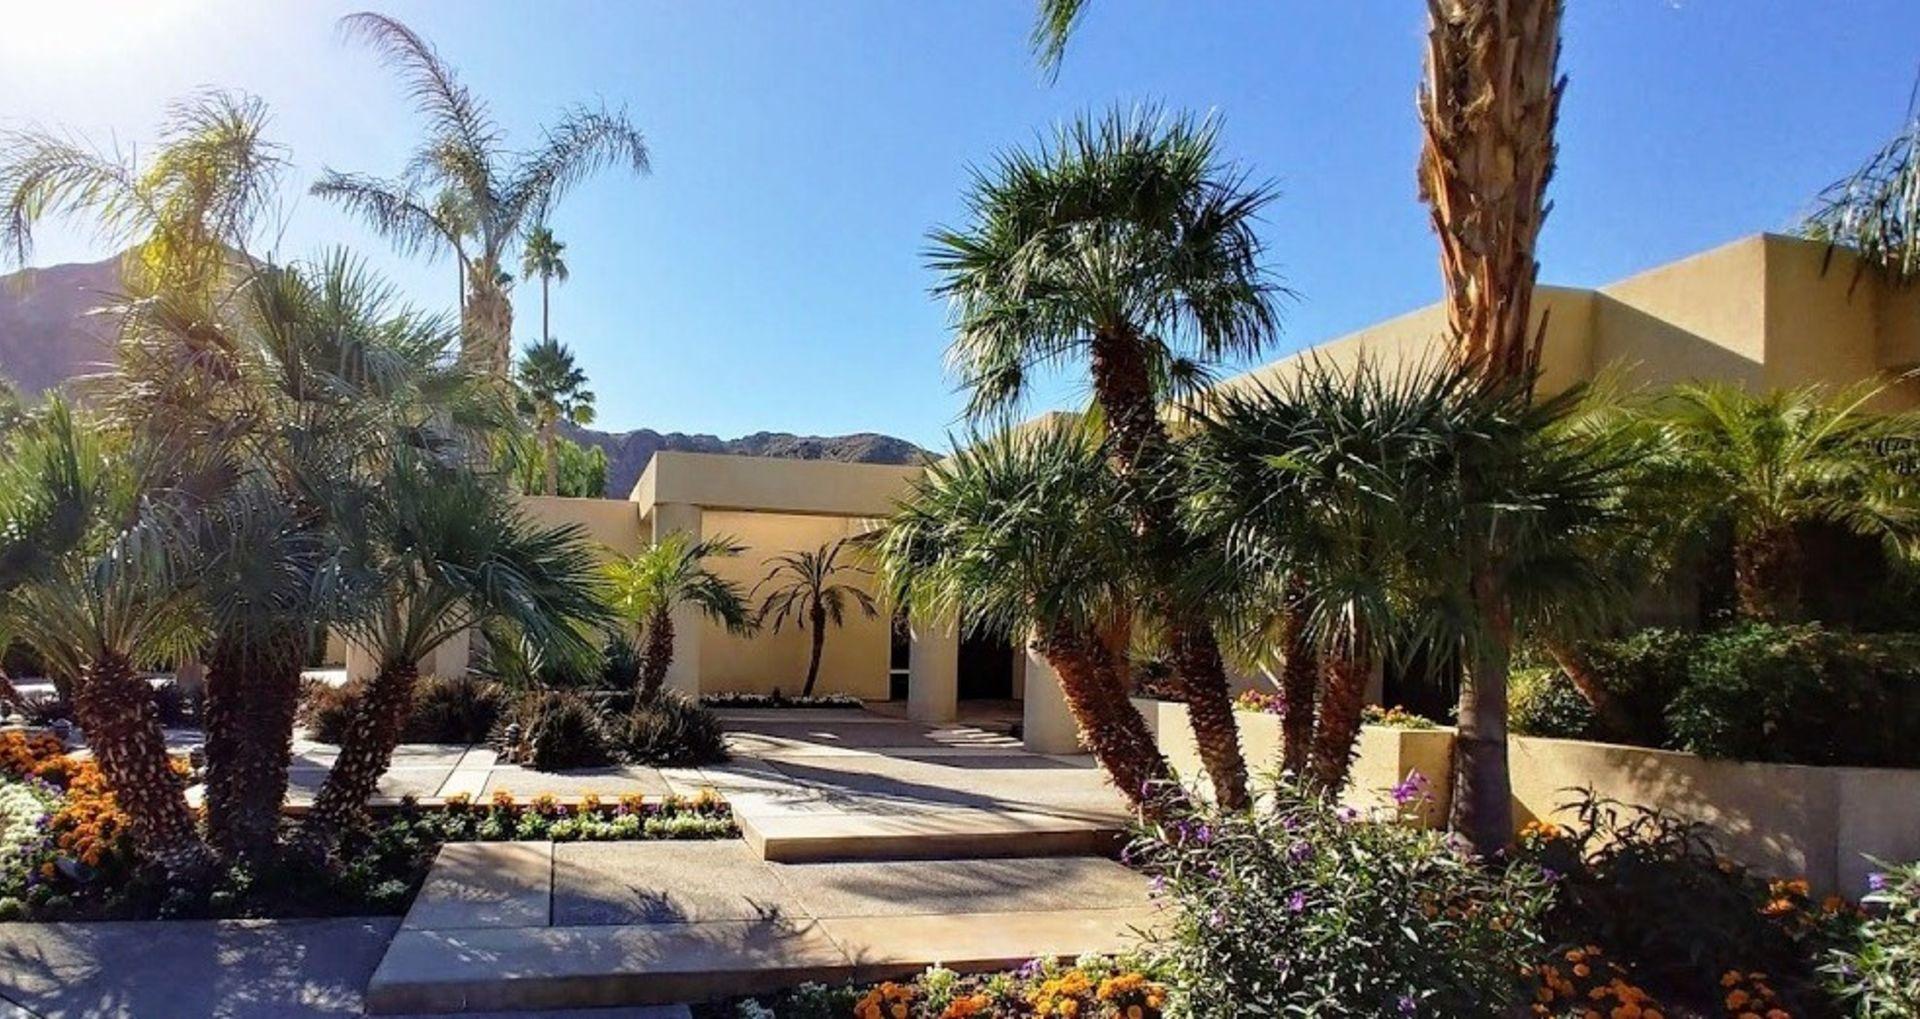 Coachella Valley Real Estate Report—June 2018